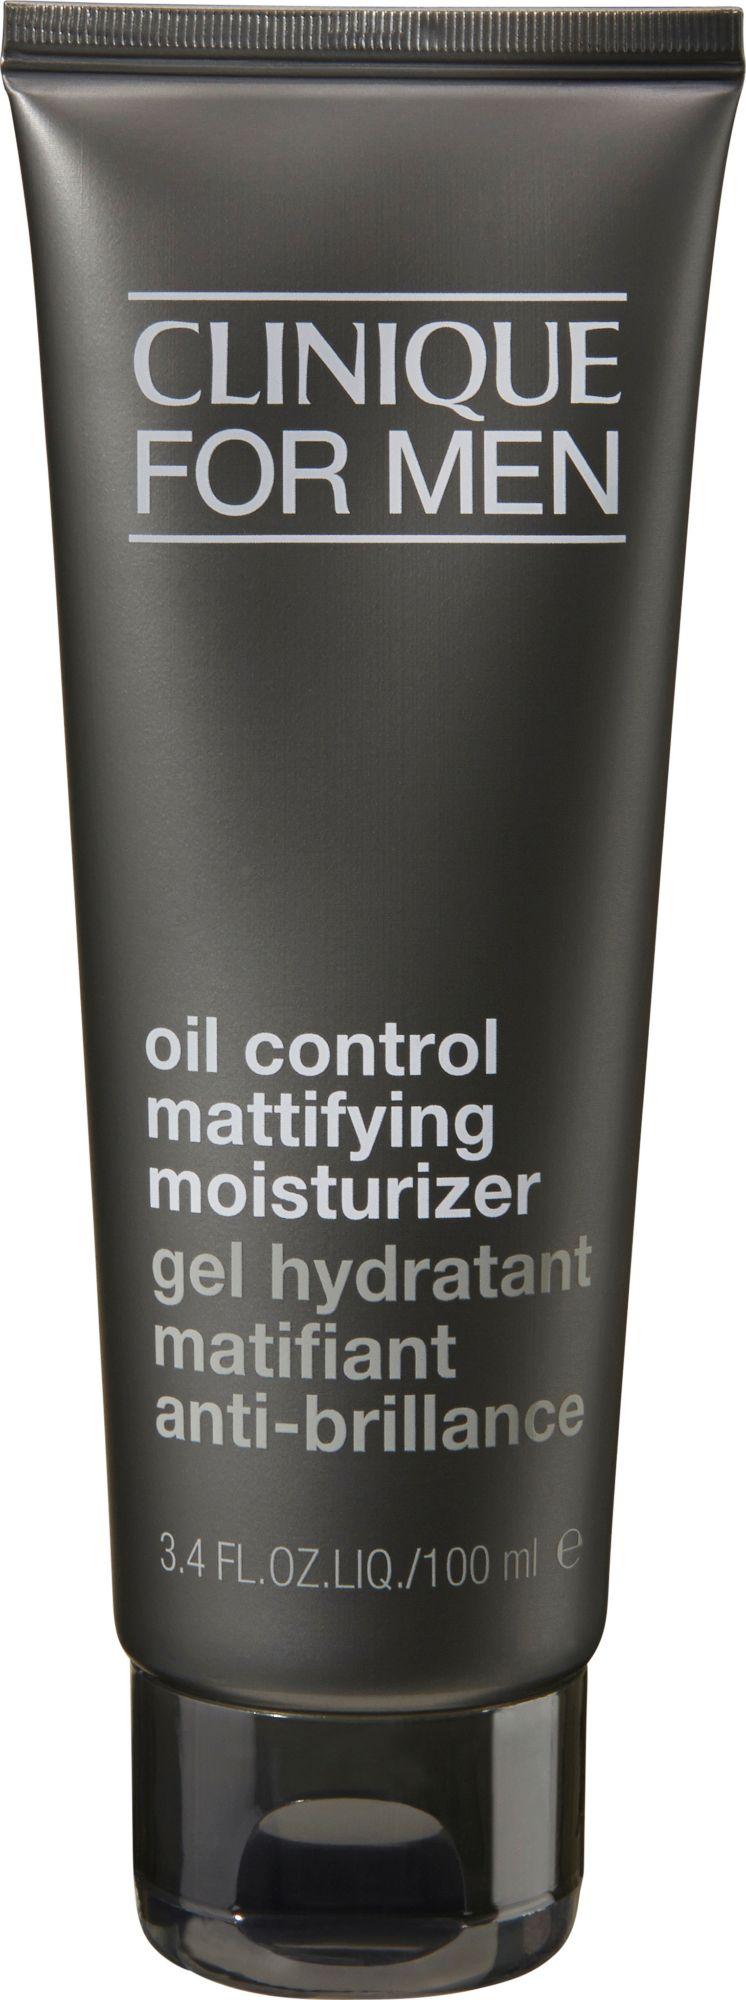 CLINIQUE Clinique, »Oil Control Mattifying Moisturizer«, Gesichtsgel